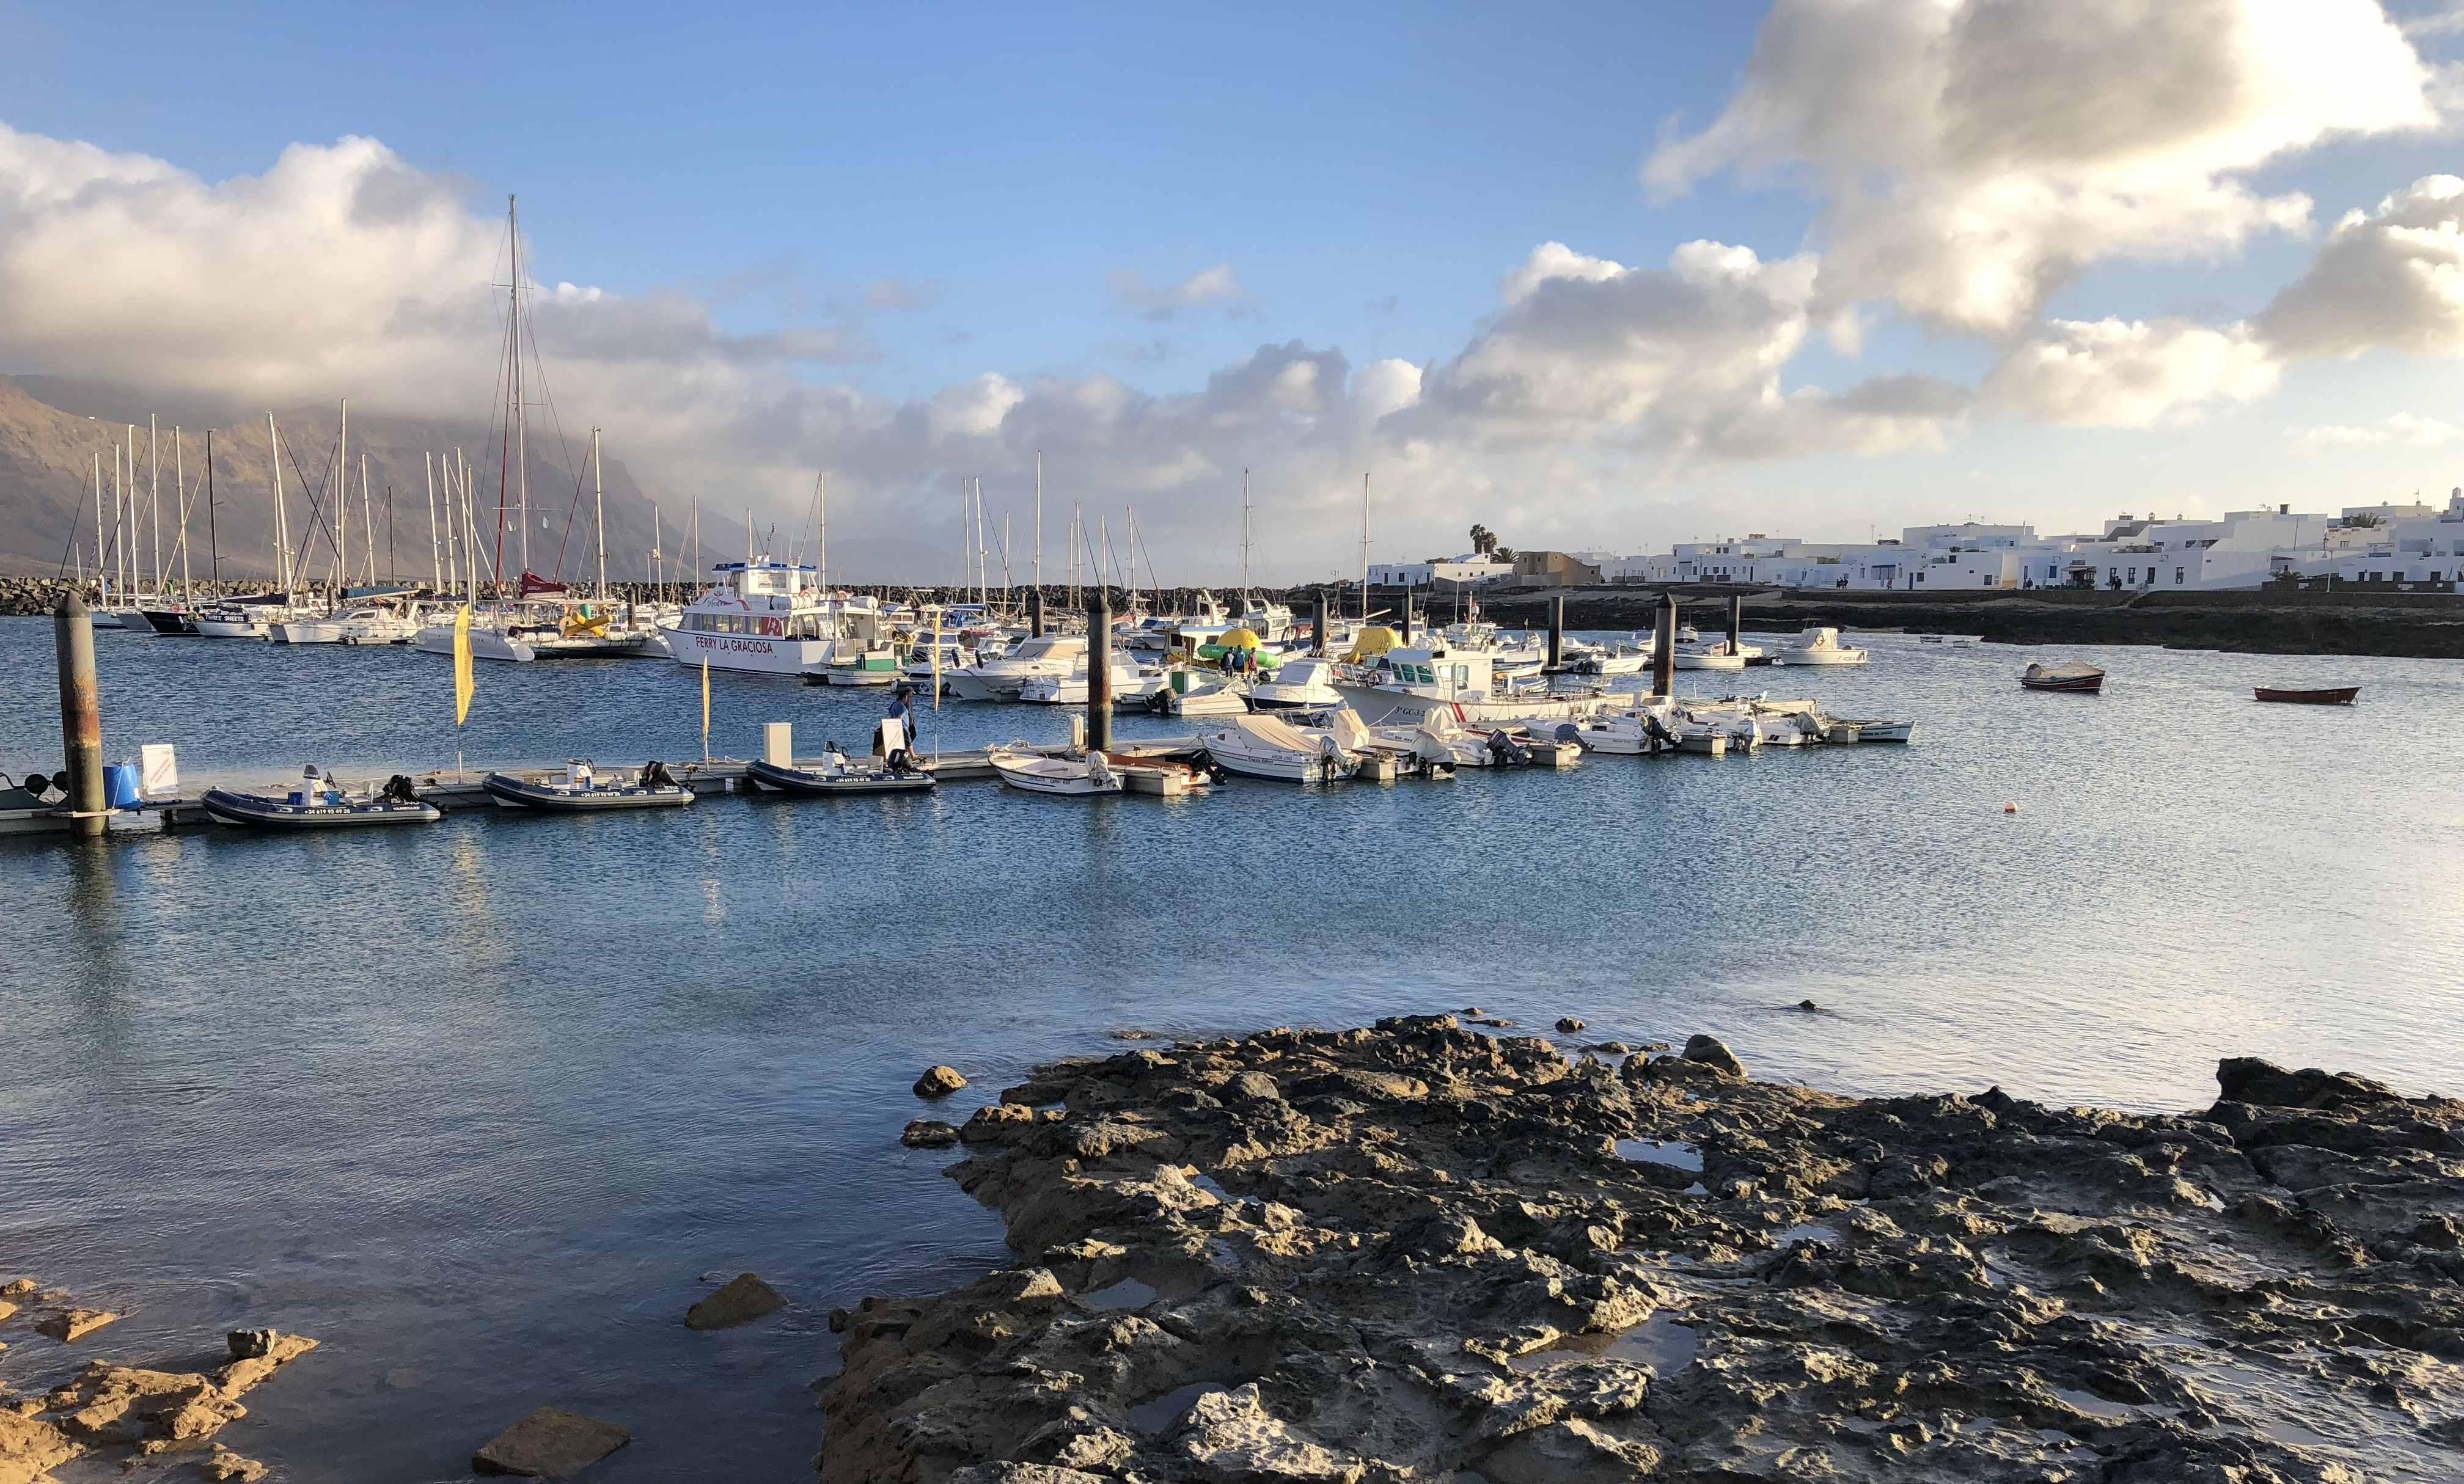 Caleta de Sebo auf La Graiosa ist das Zentrum der kanarischen Insel